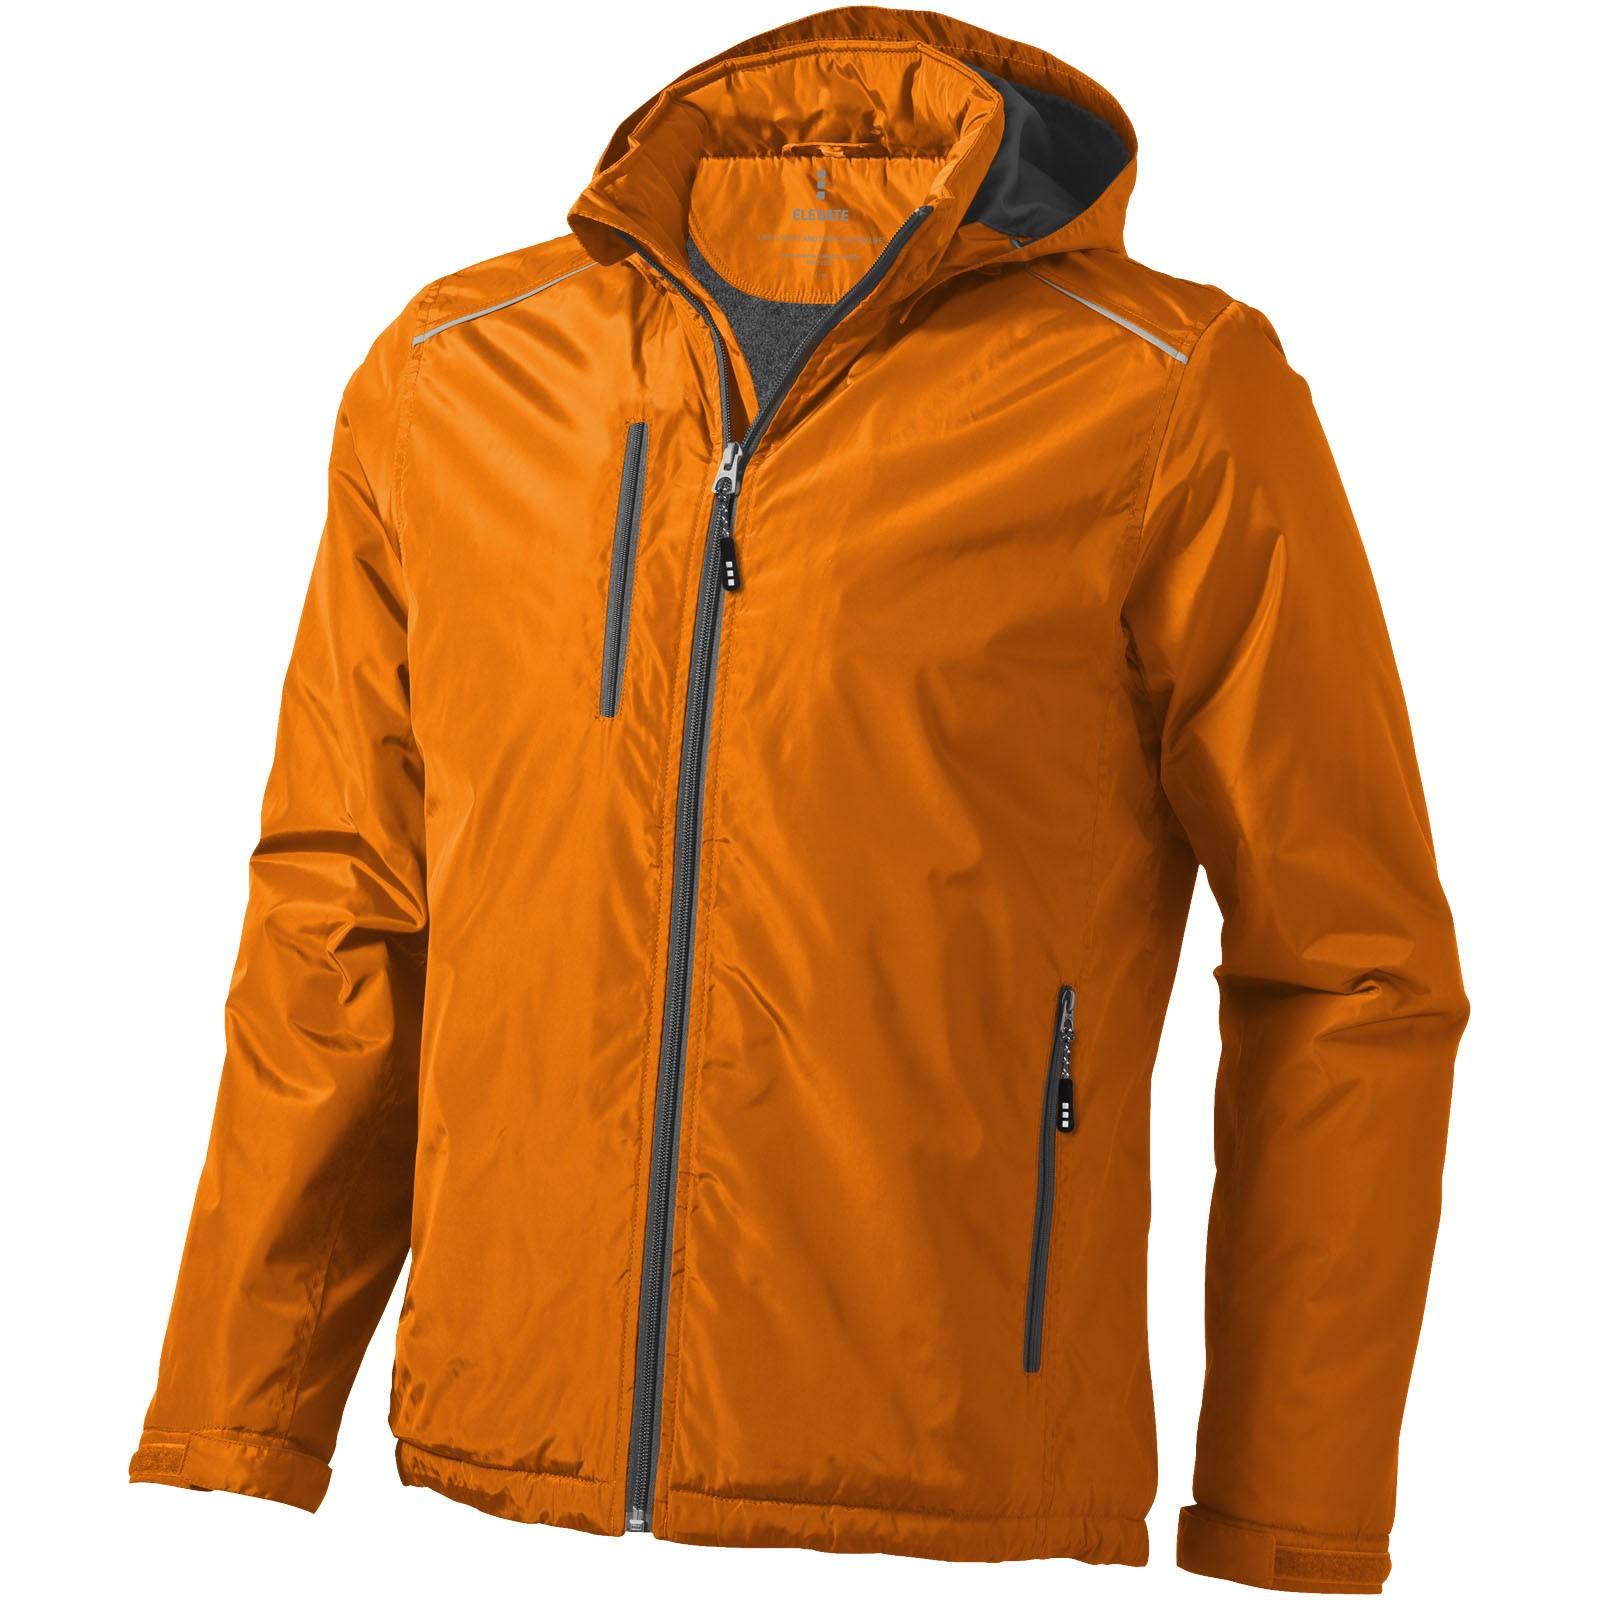 Smithers fleece lined jacket - Orange / XXL